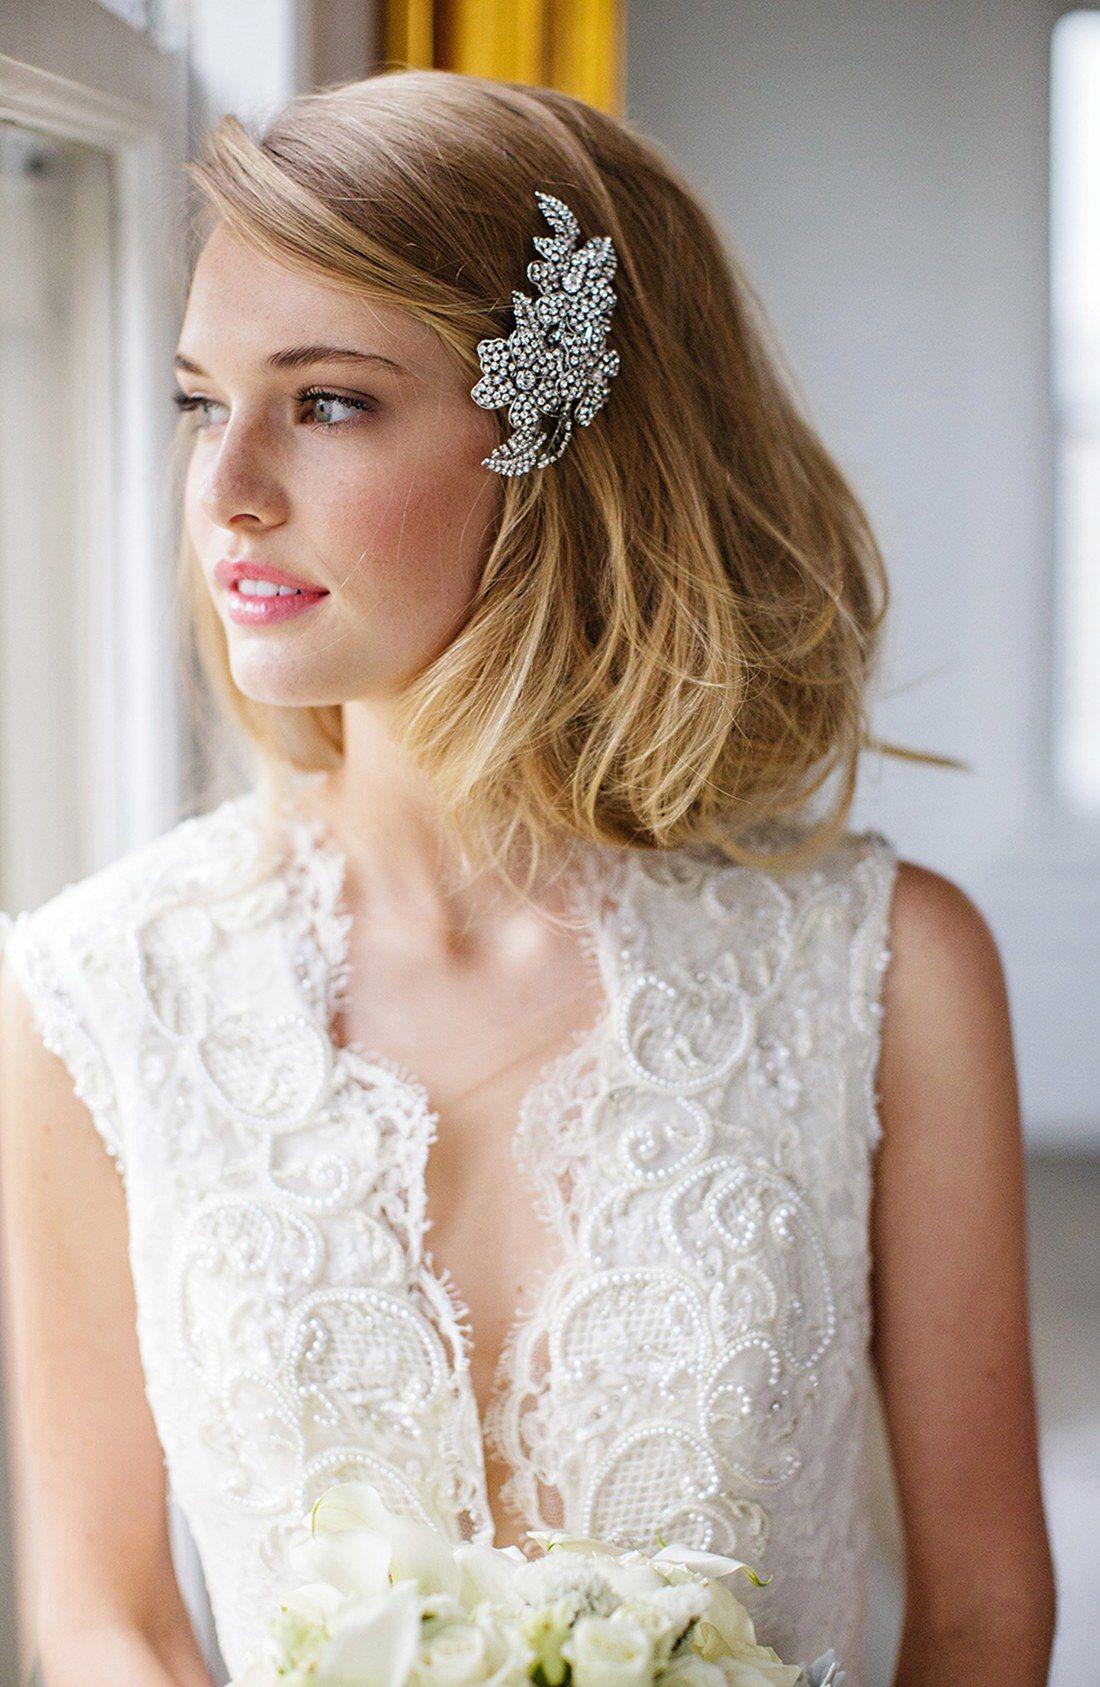 14 stylish chic hair accessories for bridal bob (or lob   lob